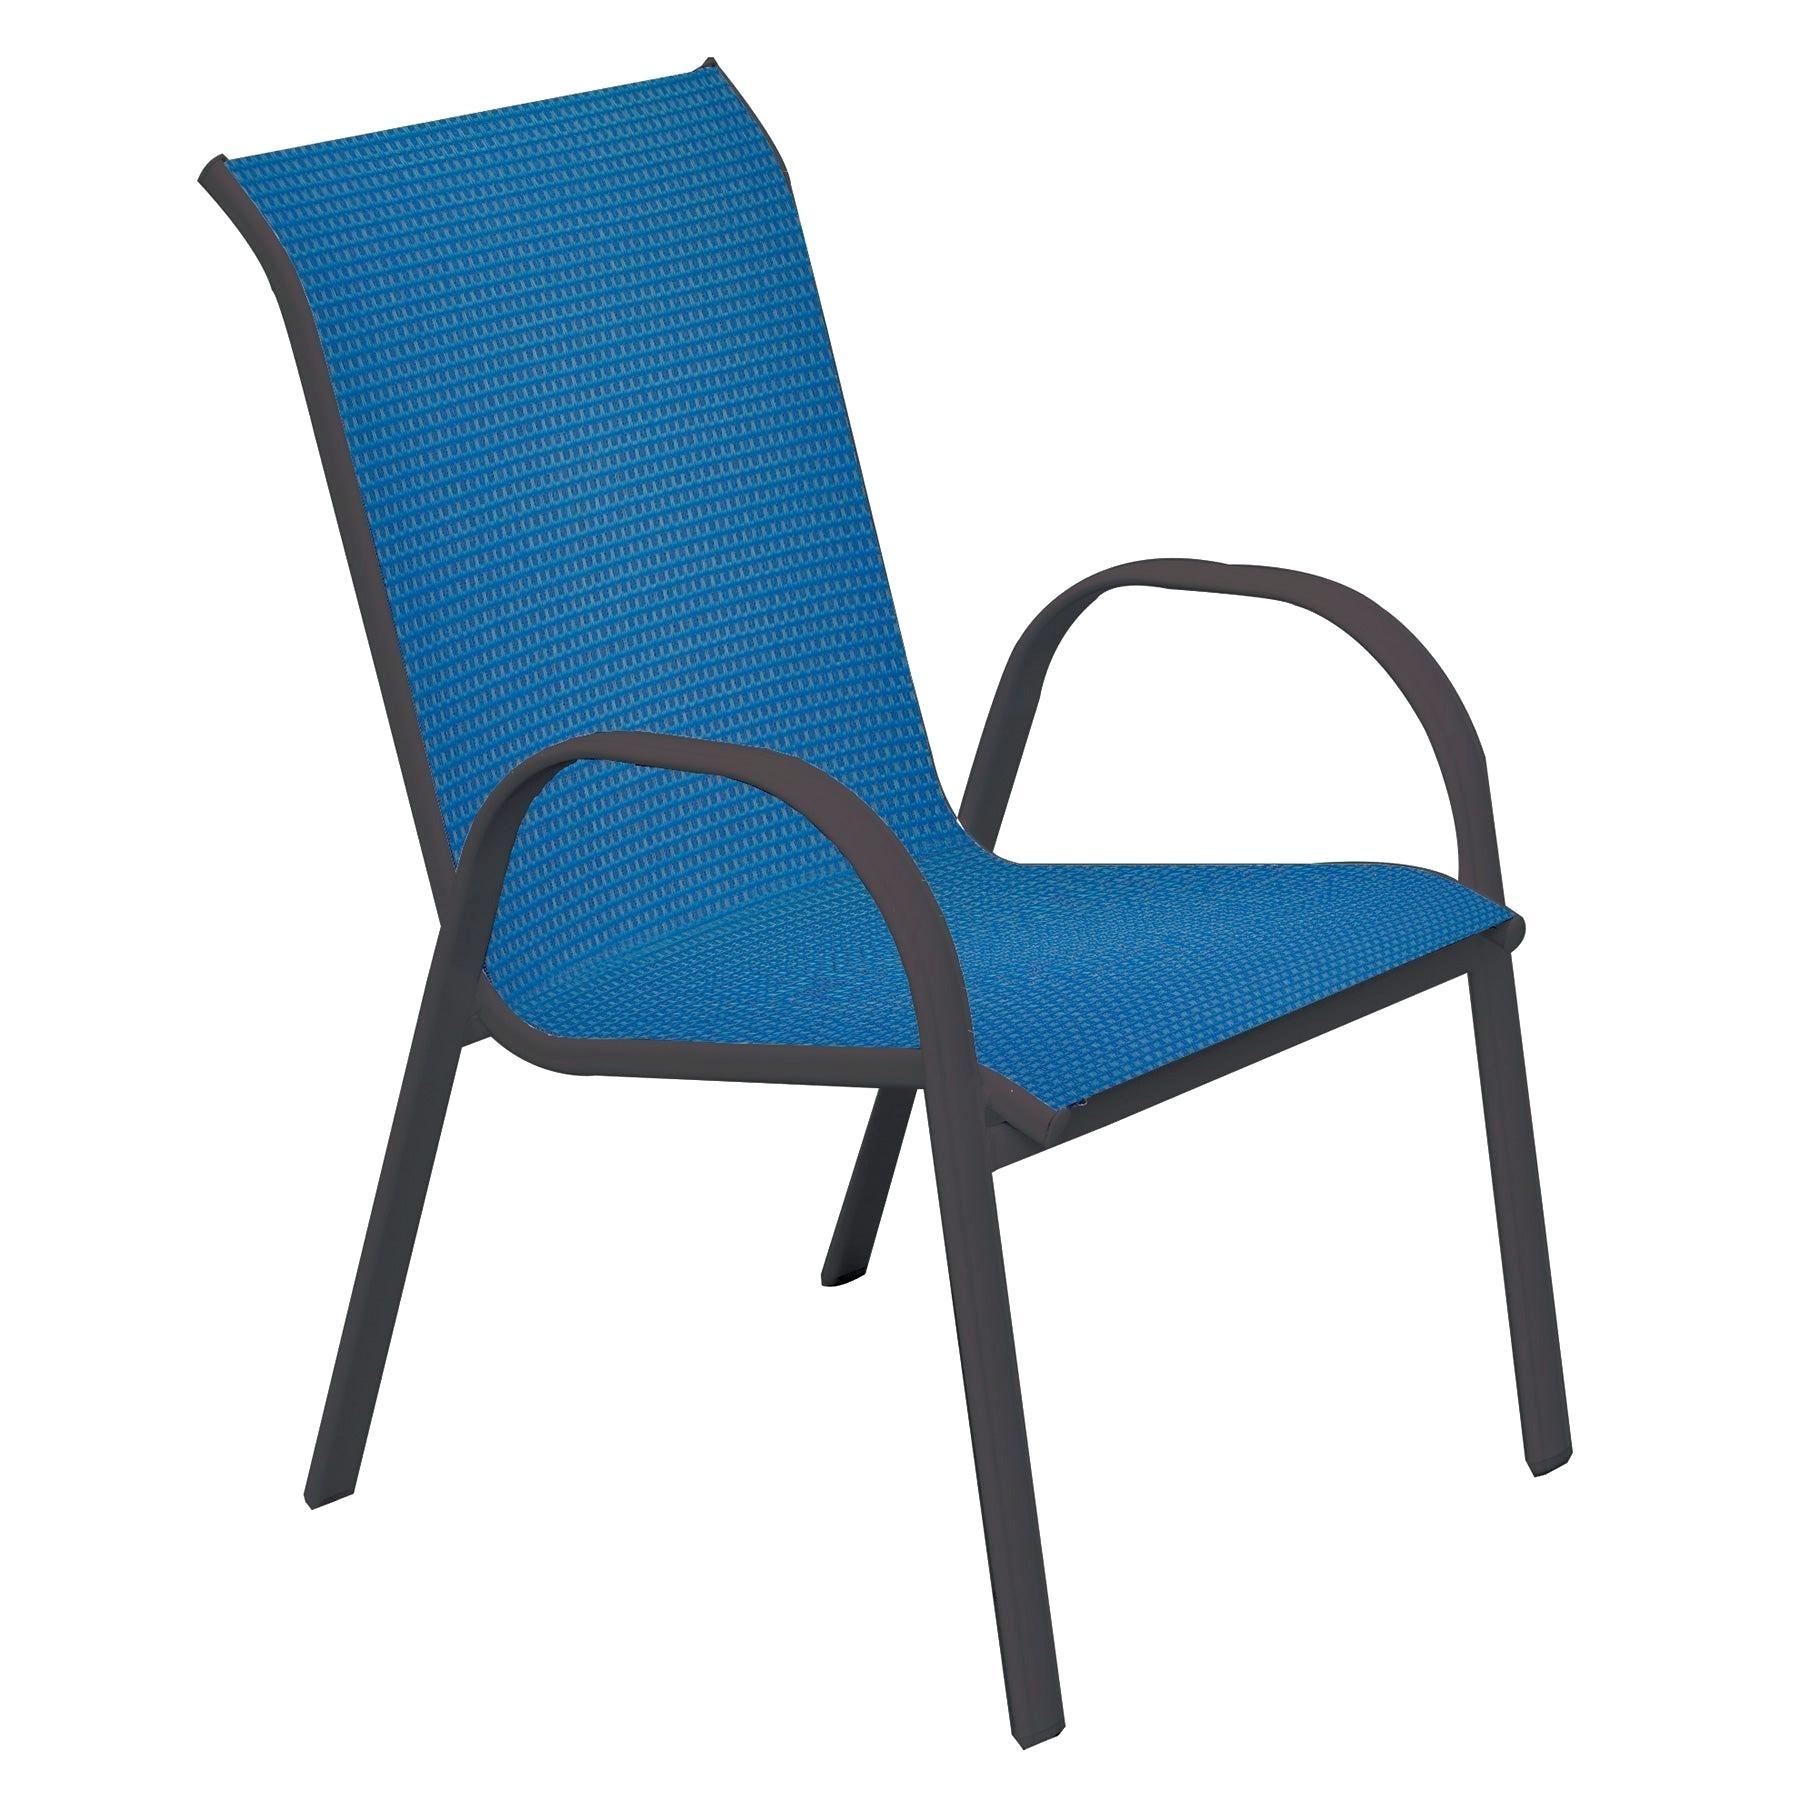 Patio Furniture Repair Phoenix Az: Sling Patio Chair Repair Kit €� Fence Ideas Site